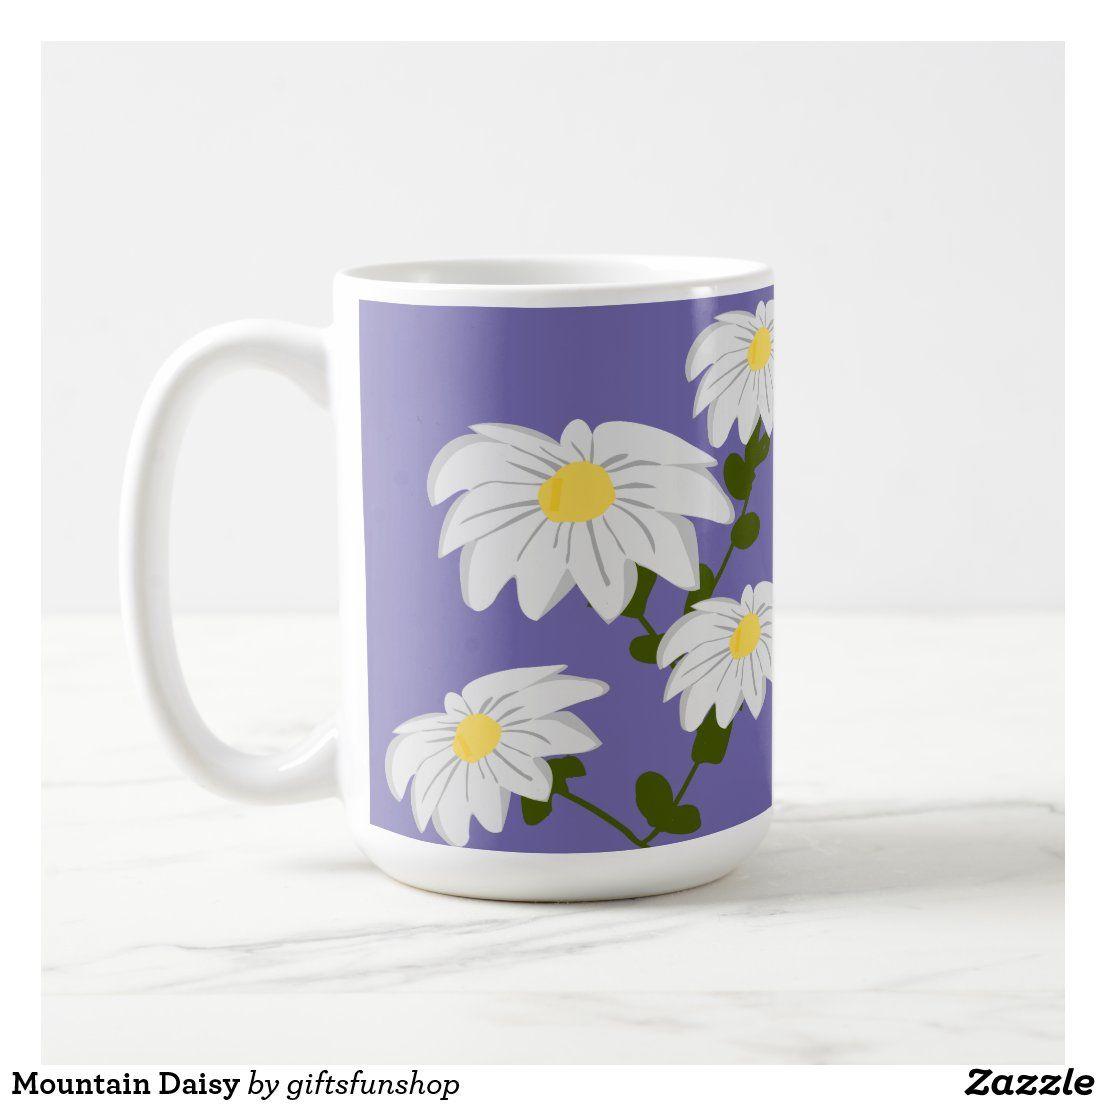 Mountain Daisy Coffee Mug Zazzle Com In 2020 Mug Decorating Mugs Coffee Mugs